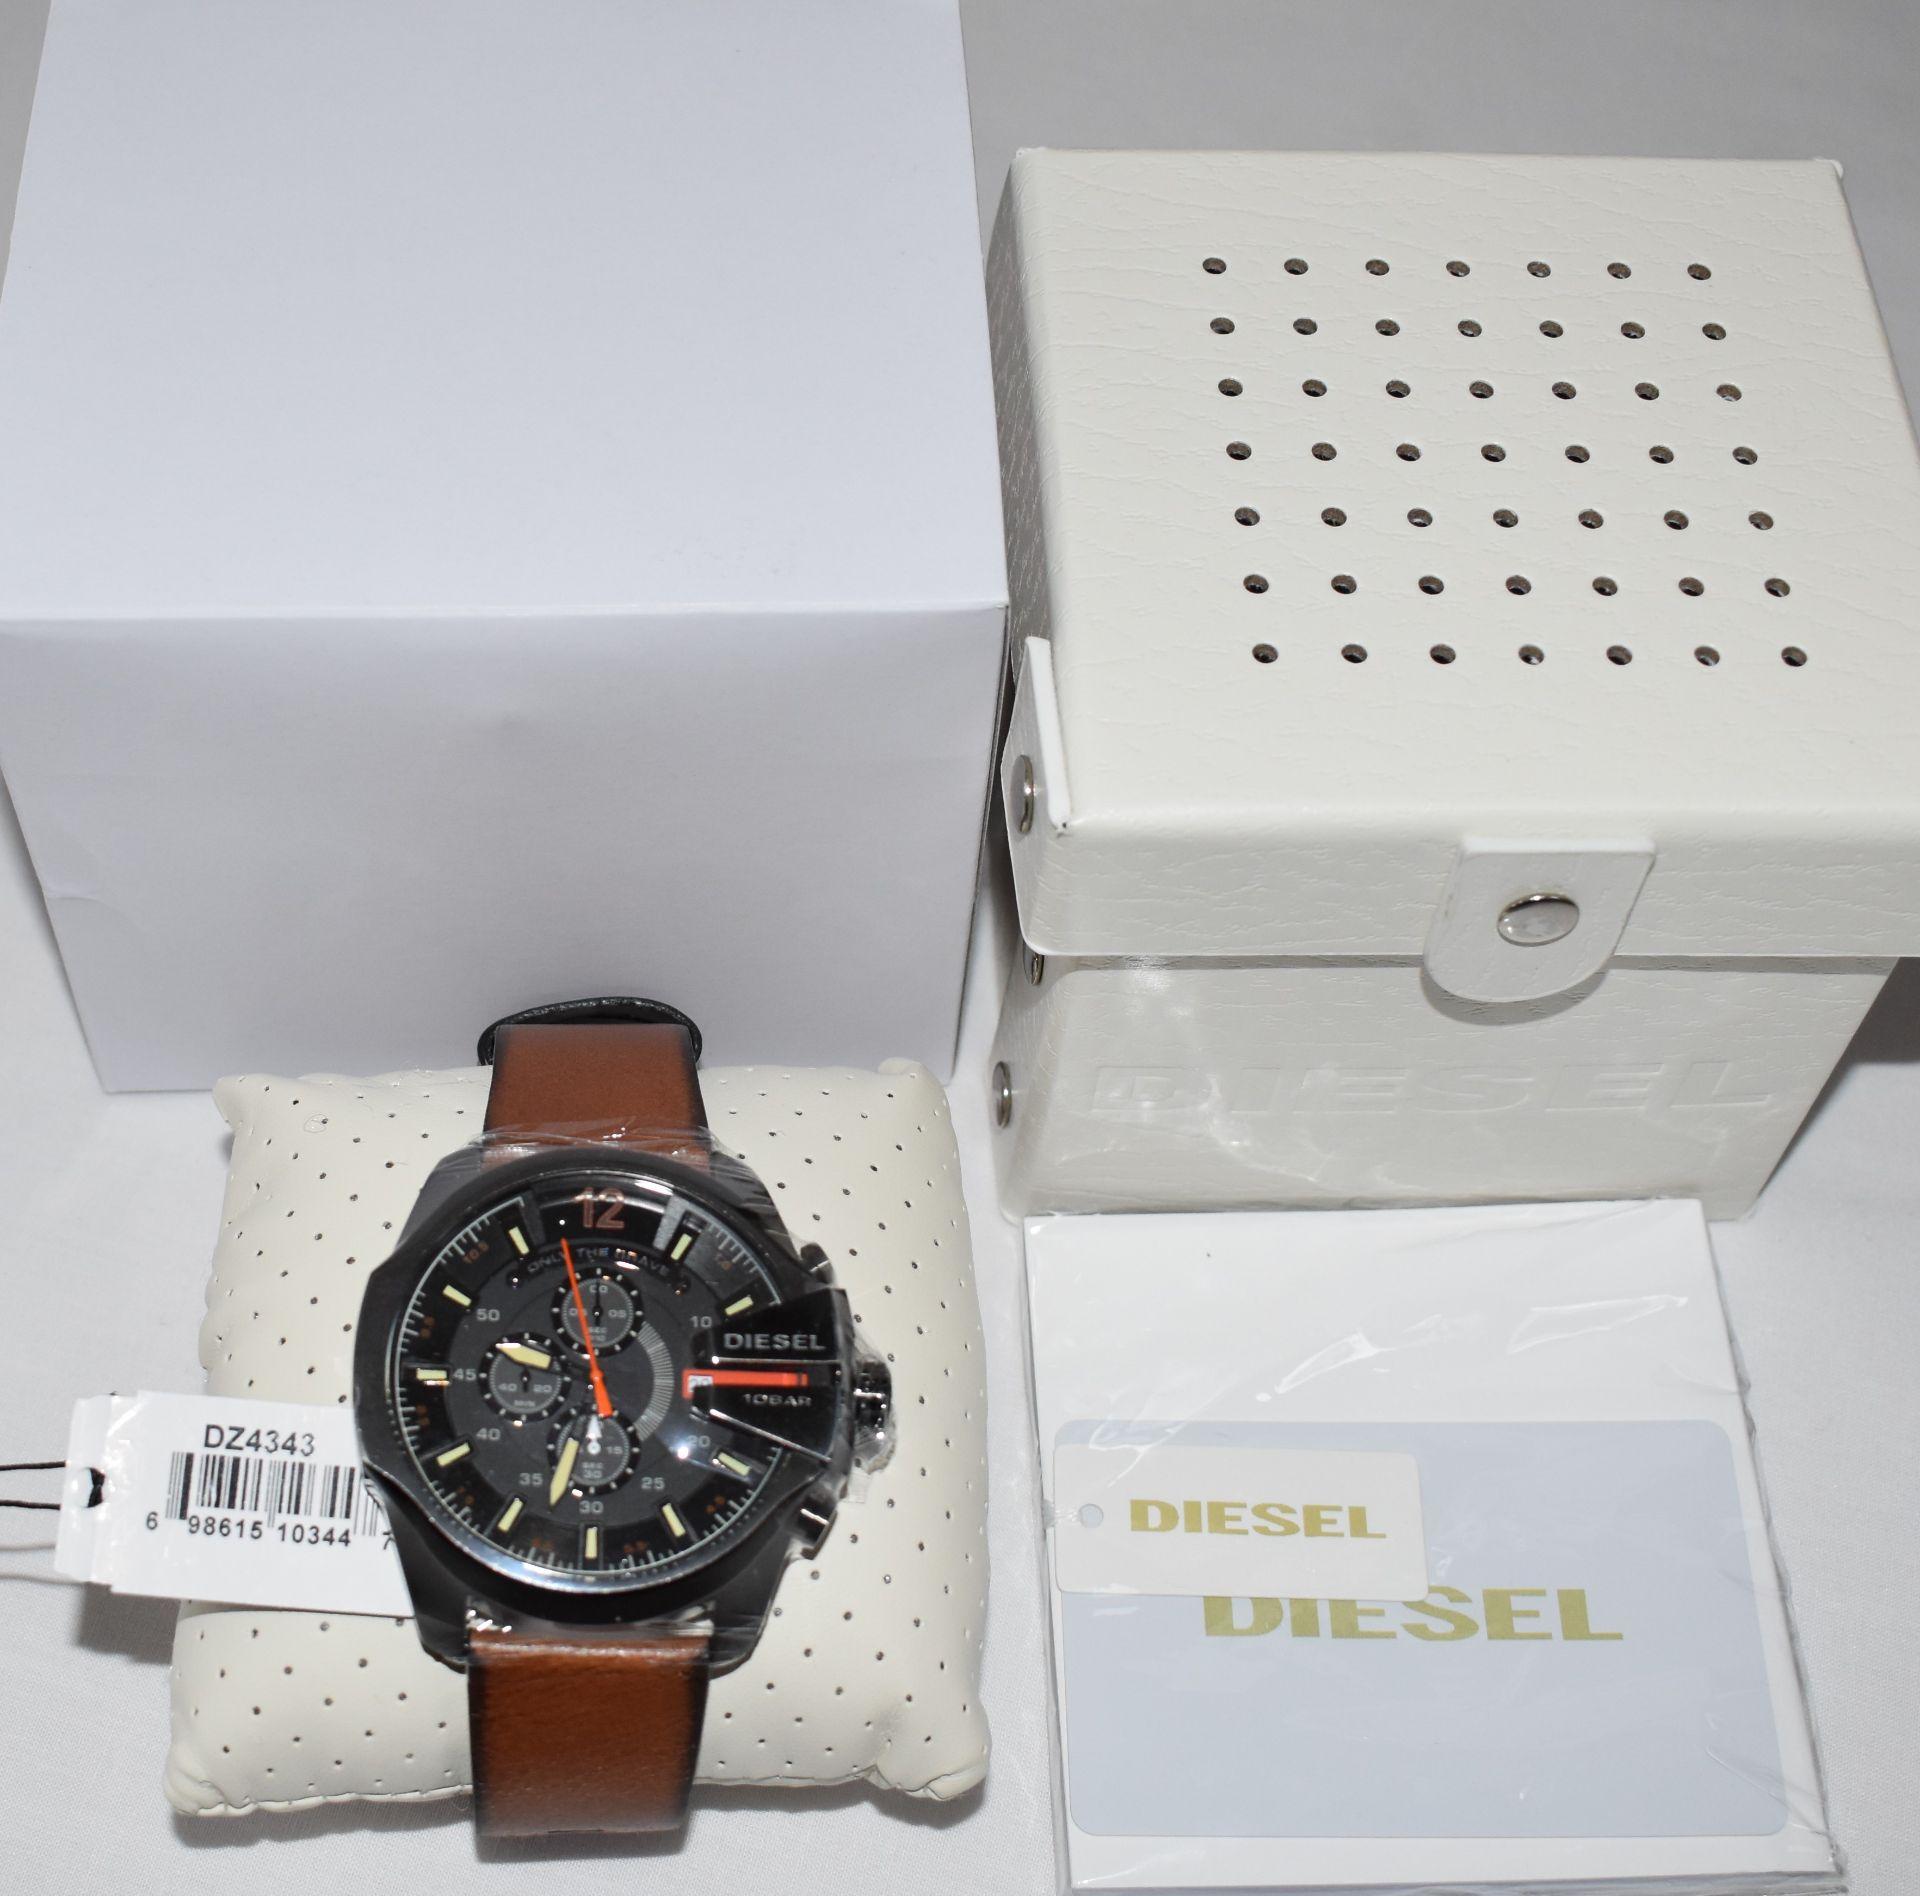 Diesel Men's Watch DZ4343 - Image 2 of 2